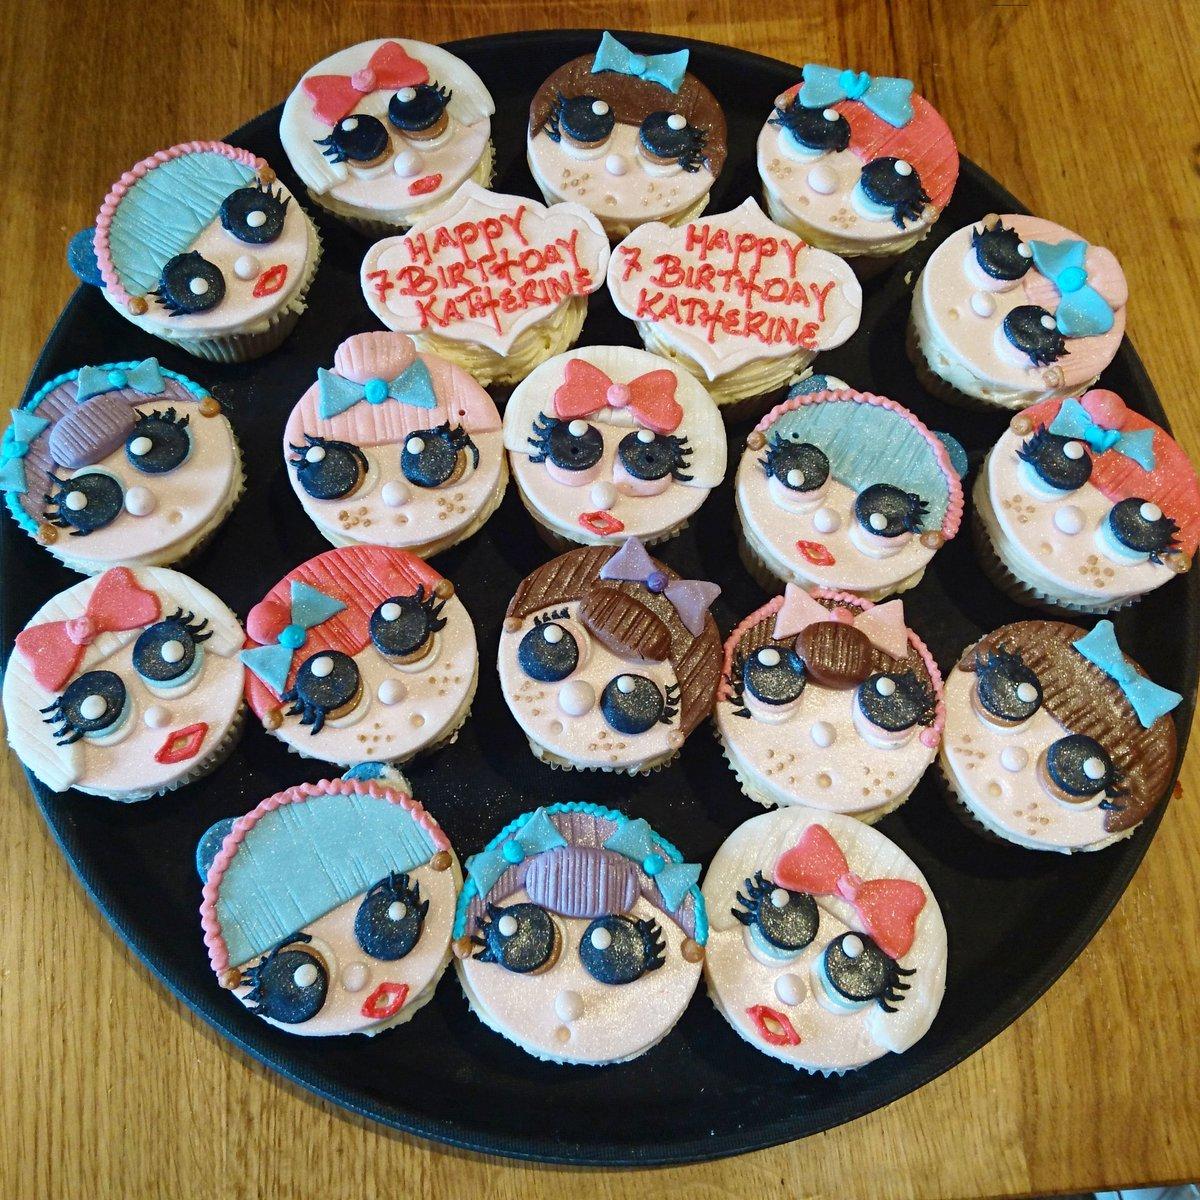 Aroma Patisserie On Twitter Lol Surprise Dolls Cupcakes